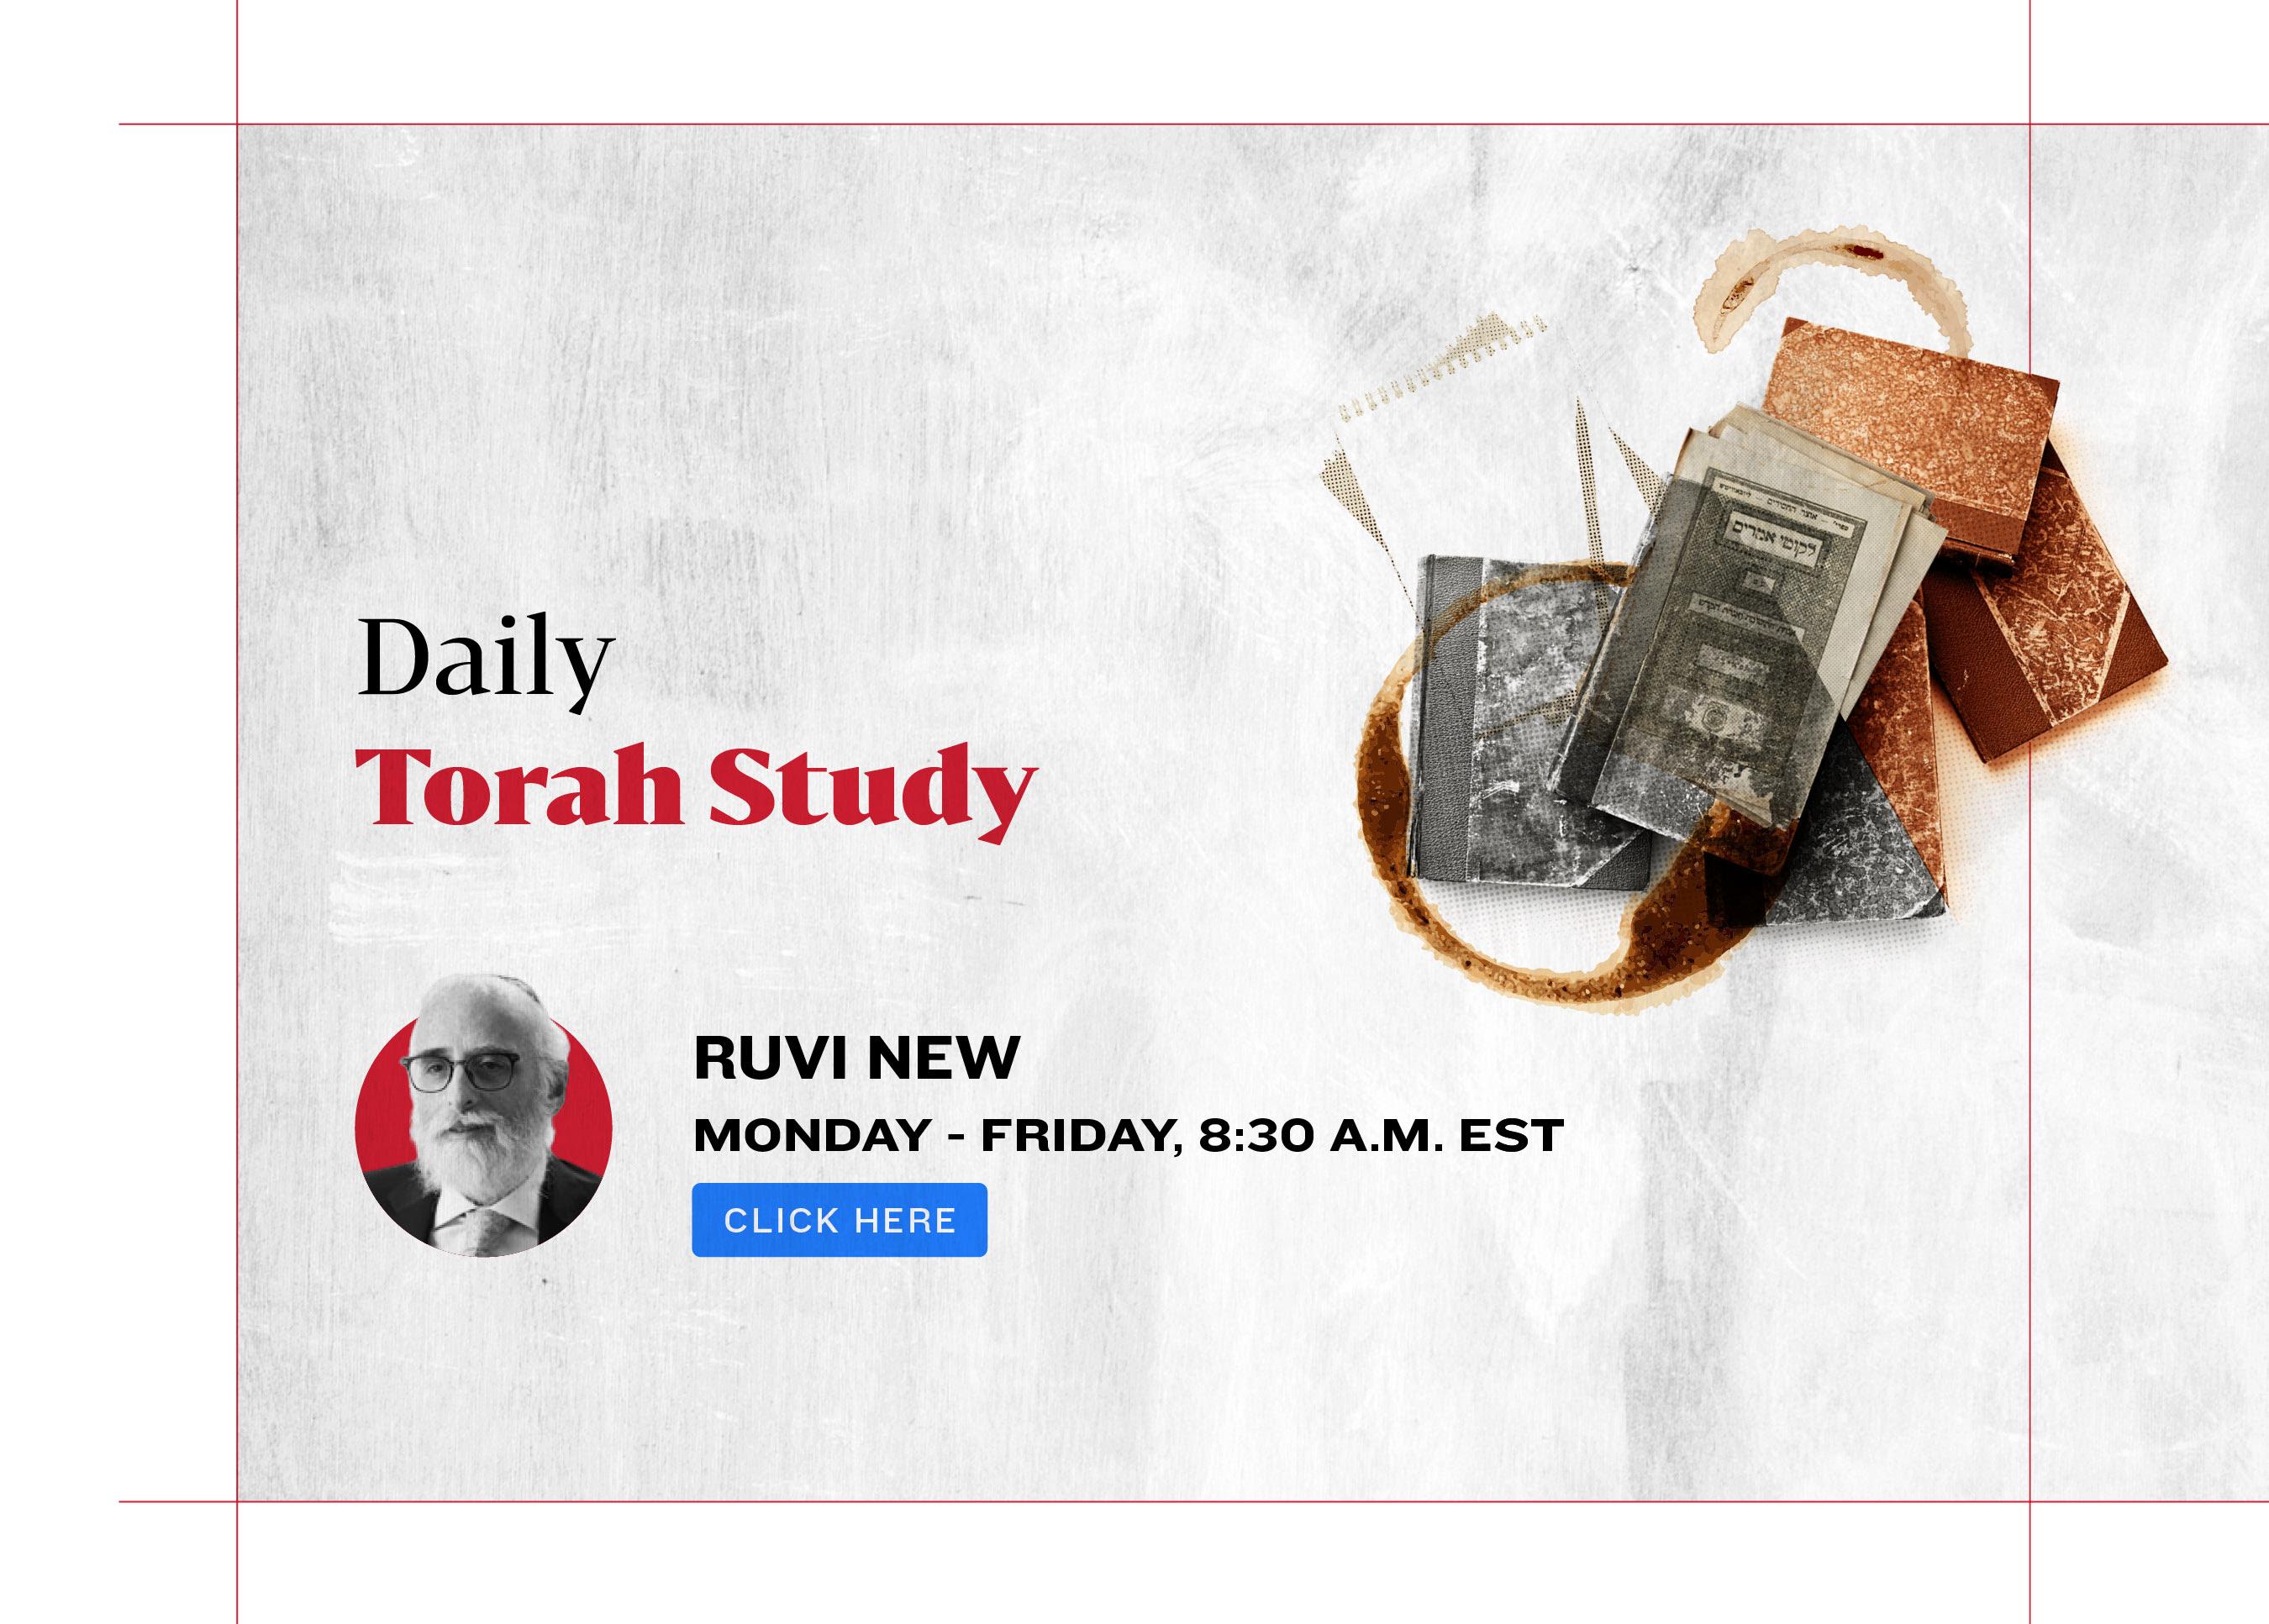 Daily Torah Study. Rabbi Ruvi New